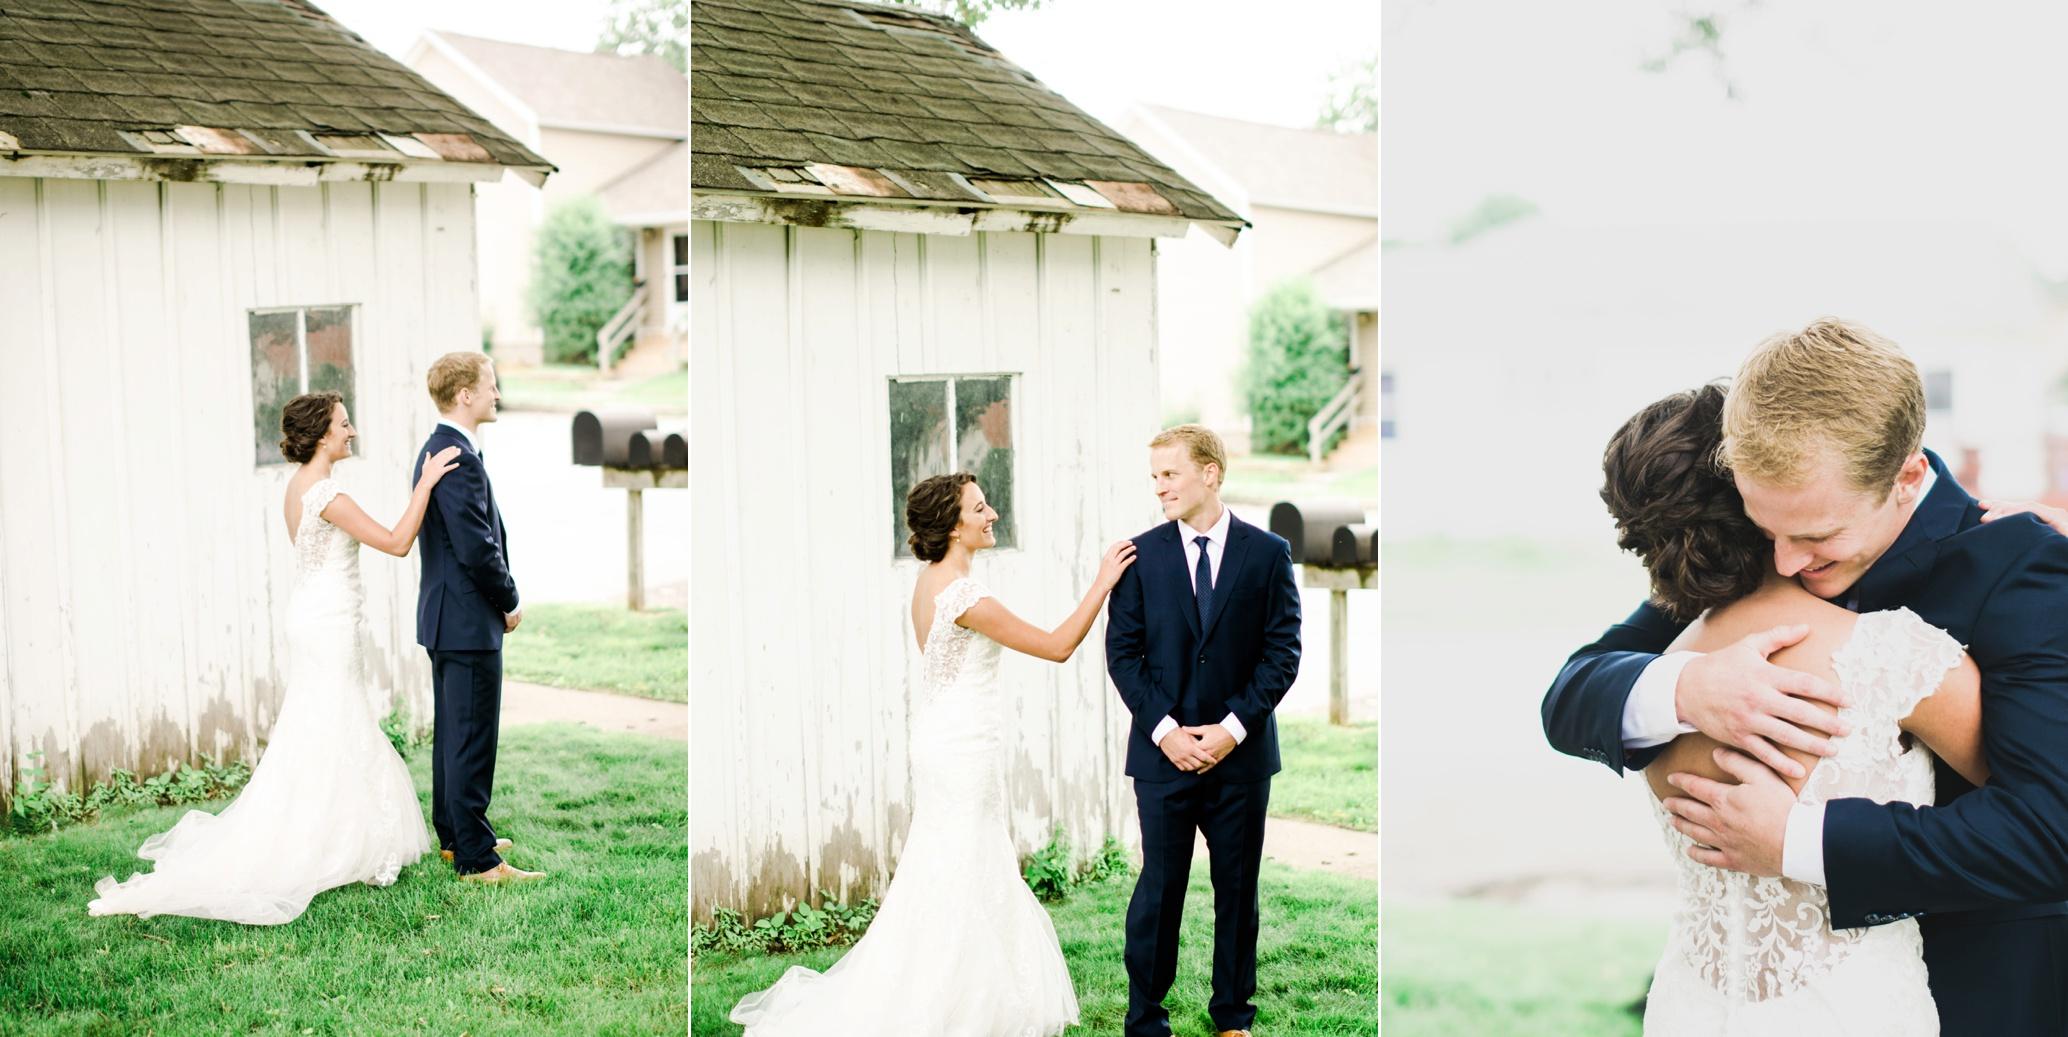 Palmer House and Stable Solon, IA | Ali Leigh Photo Minneapolis Wedding Photographer_0240.jpg